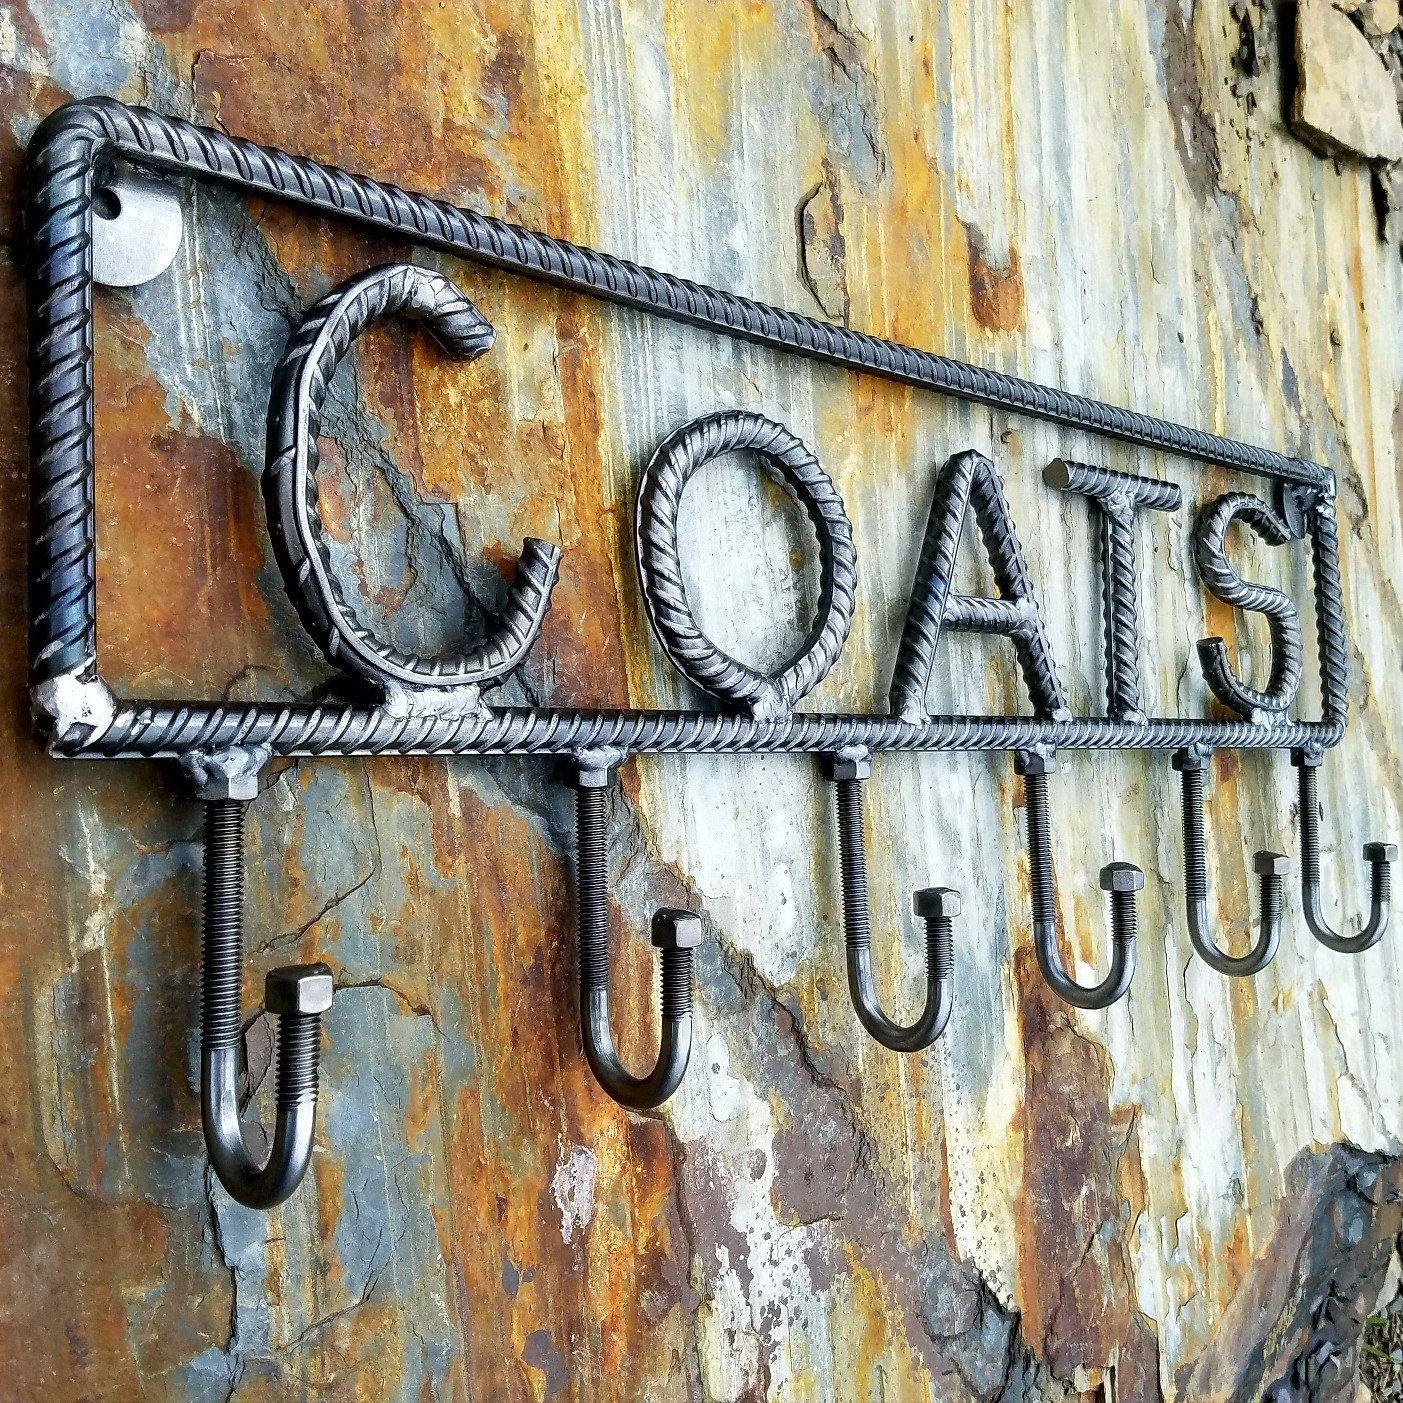 Rebar Coat Rack Decor Rustic Home Metal Art 6 Hook Bolt Welding S Deco Steel Wall Hooks